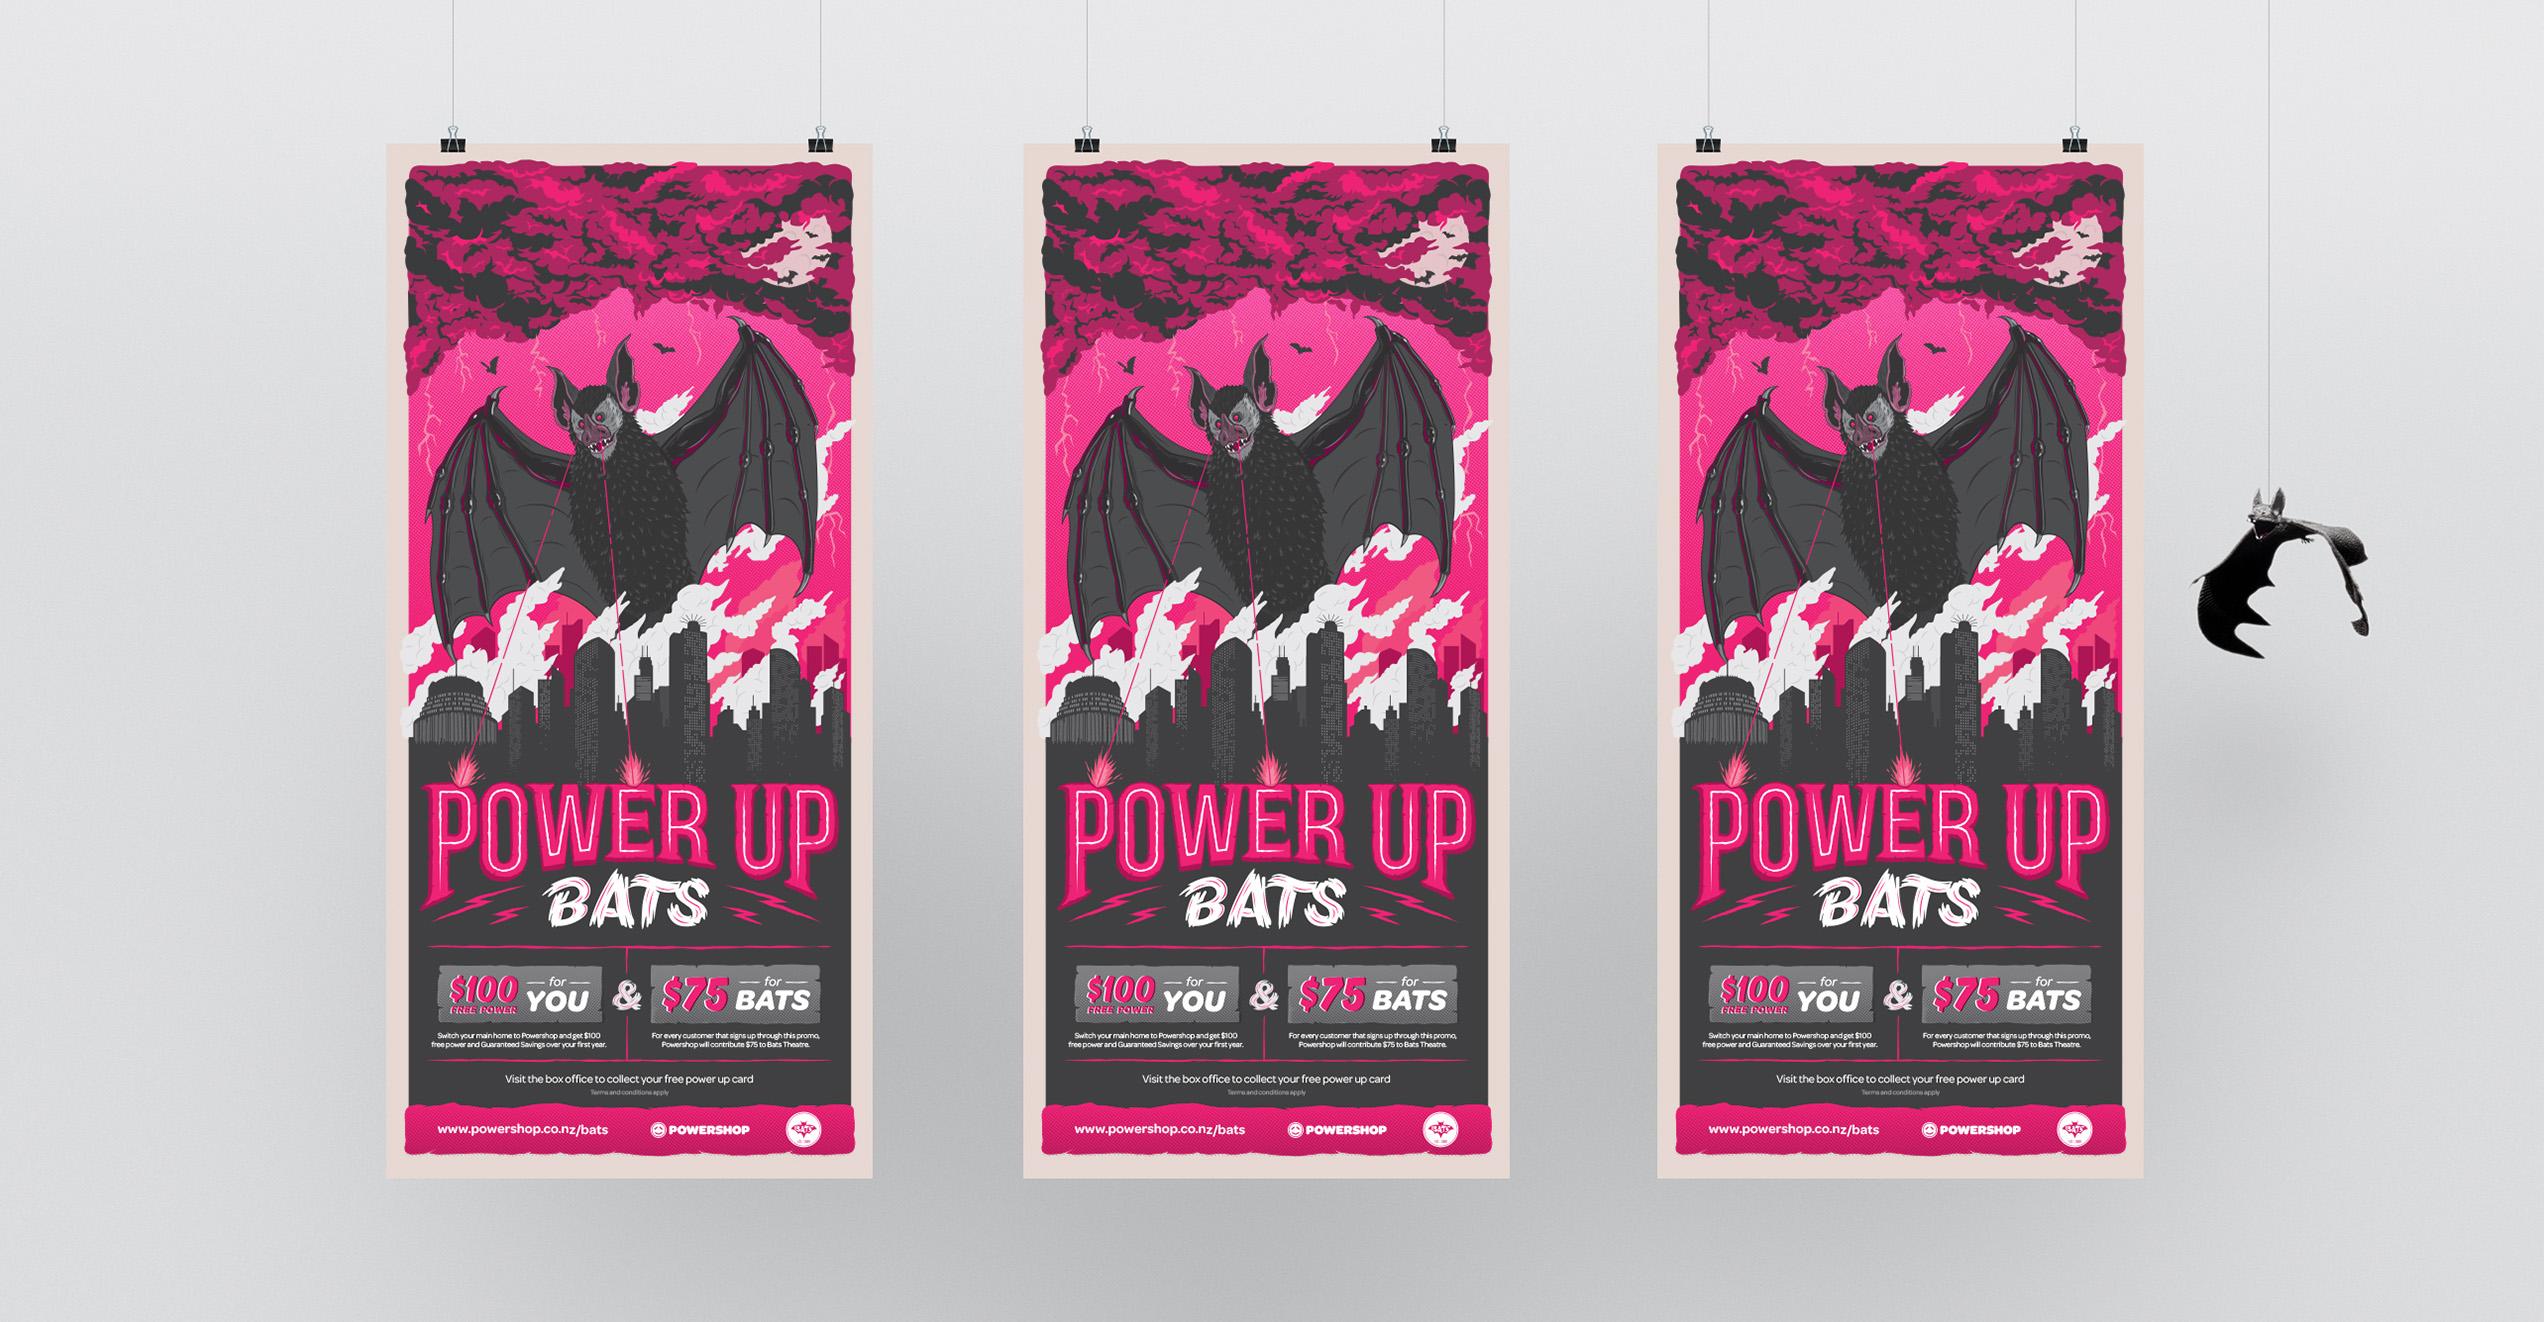 Power Up Bats Campaign